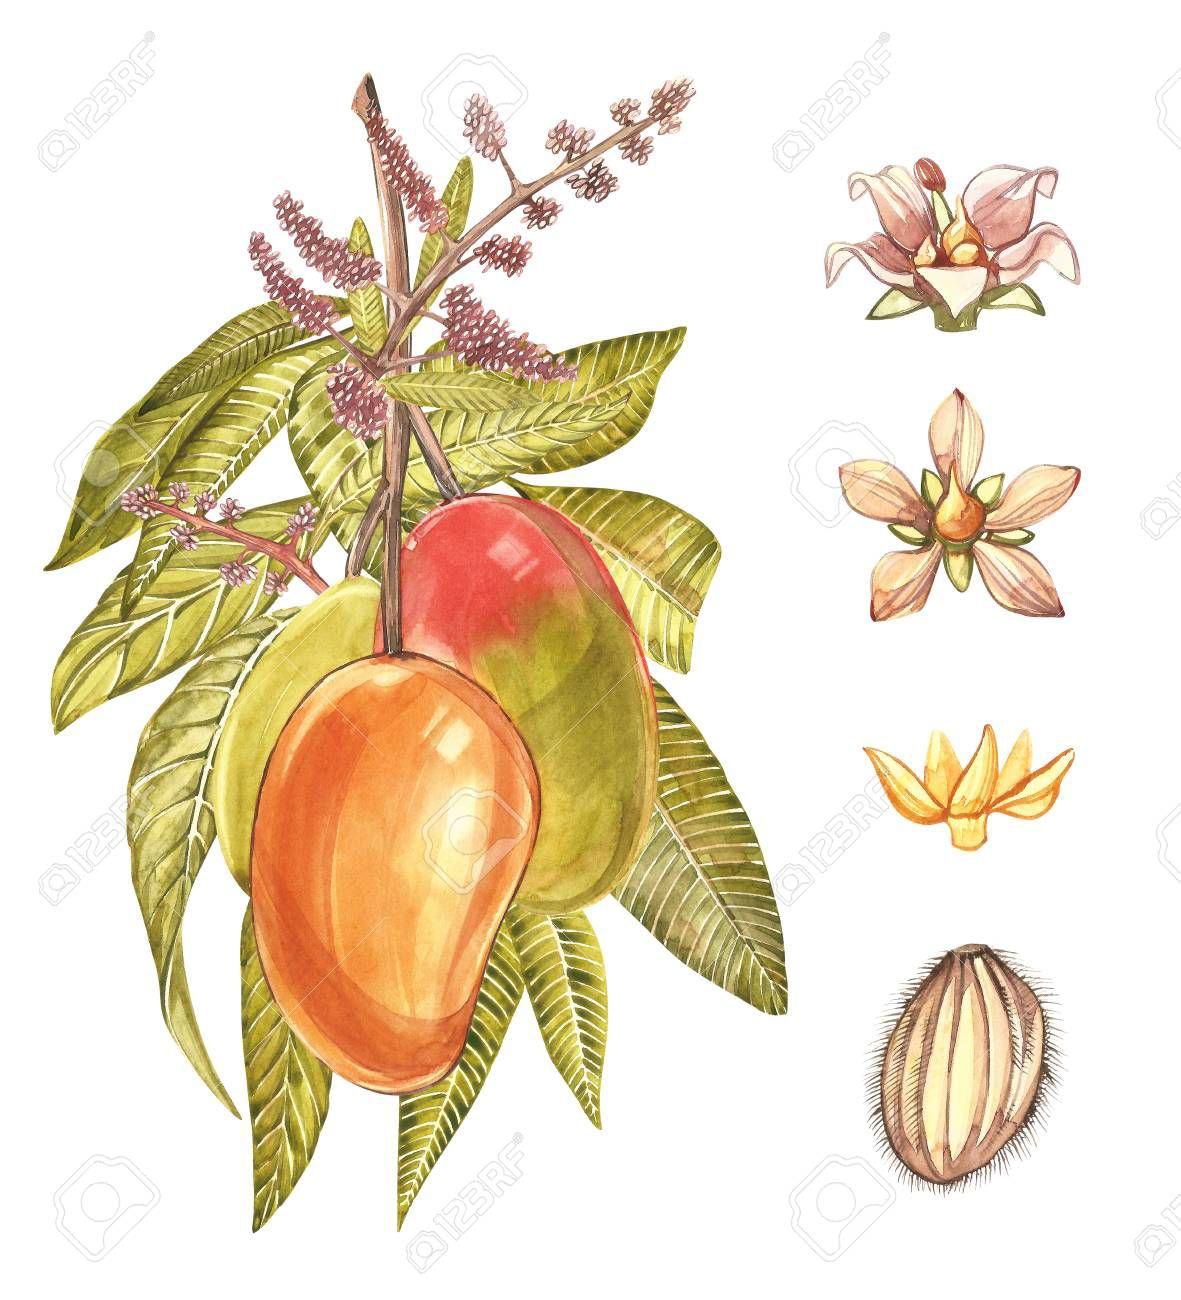 Plant-illustration-of-African-Mango